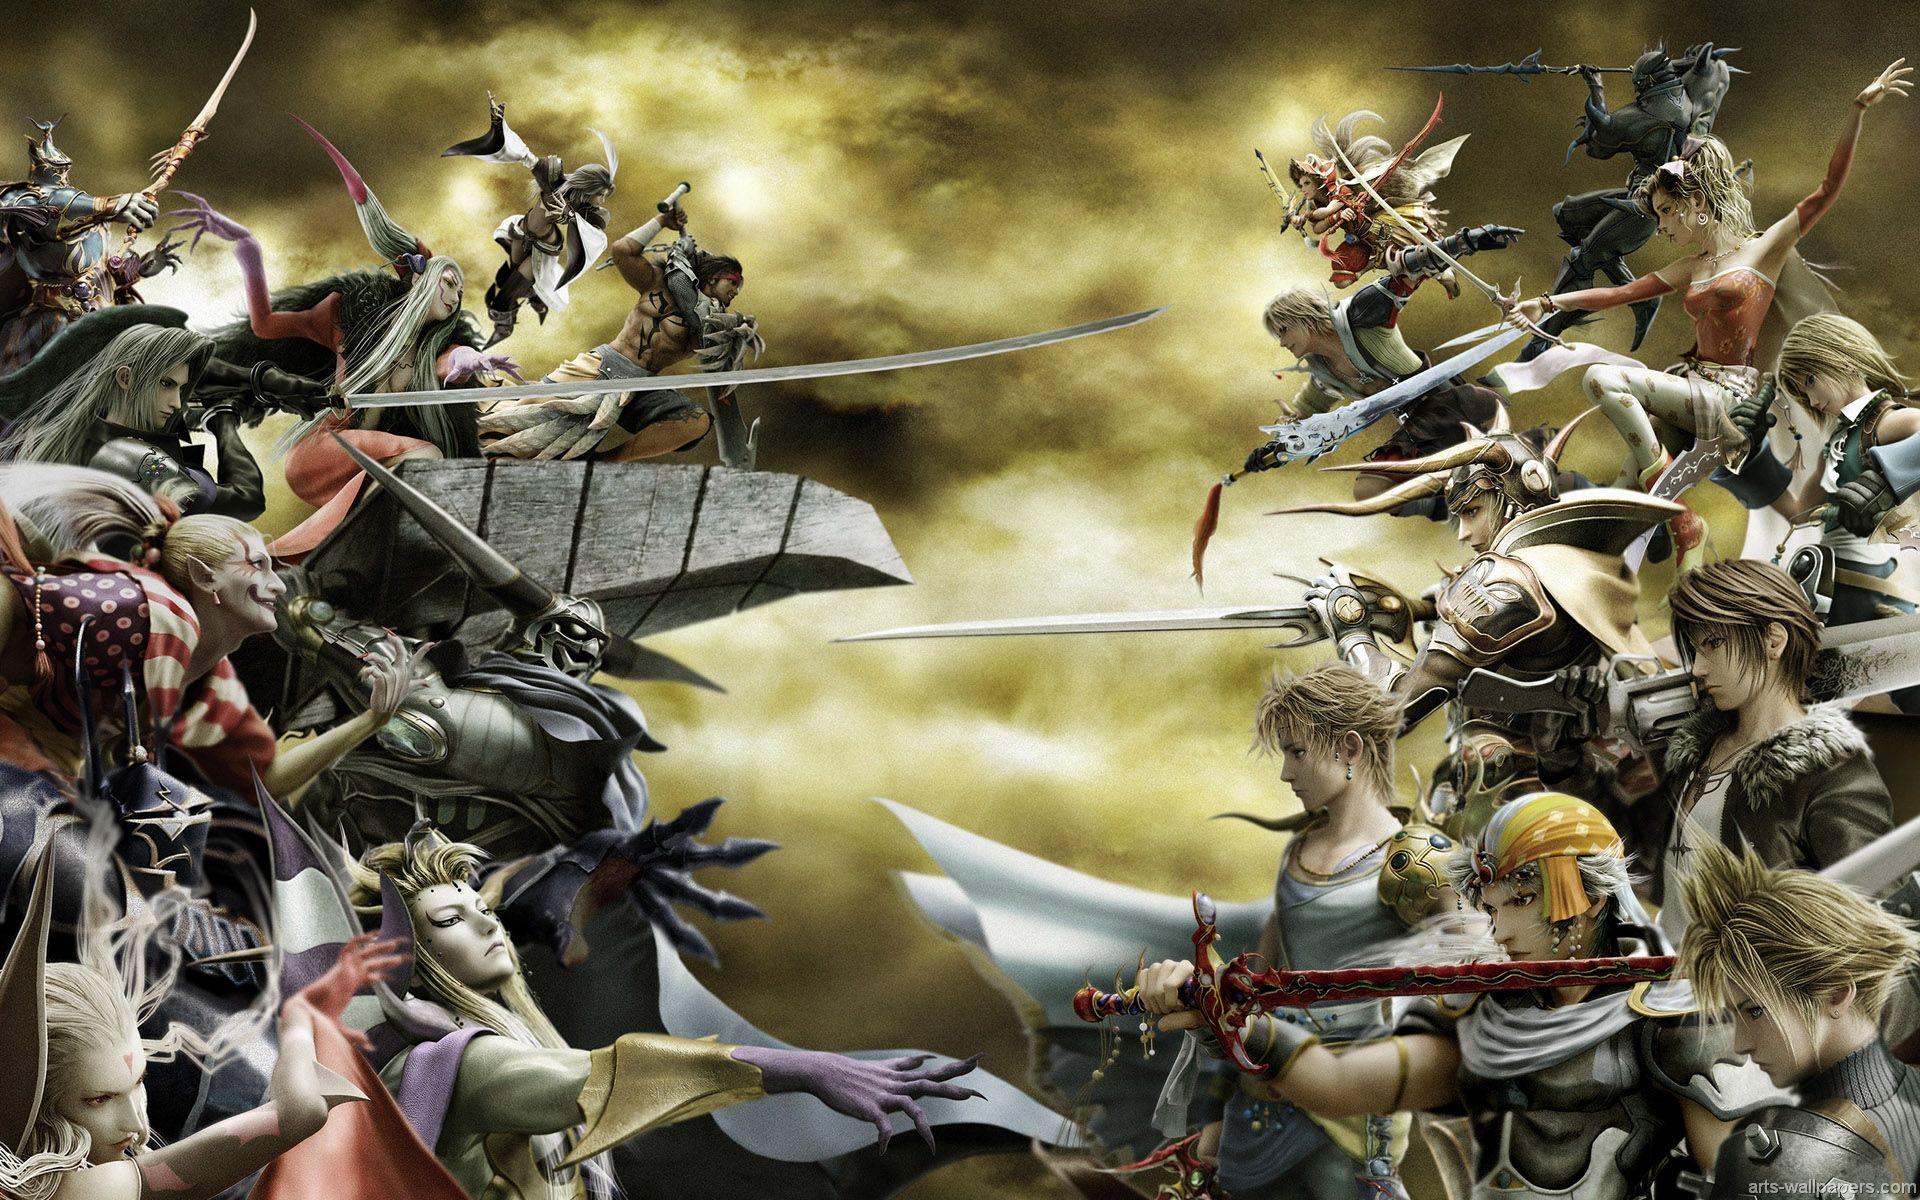 fantasy wallpaper and backgrounds | Final Fantasy Prints Art Wall a ...